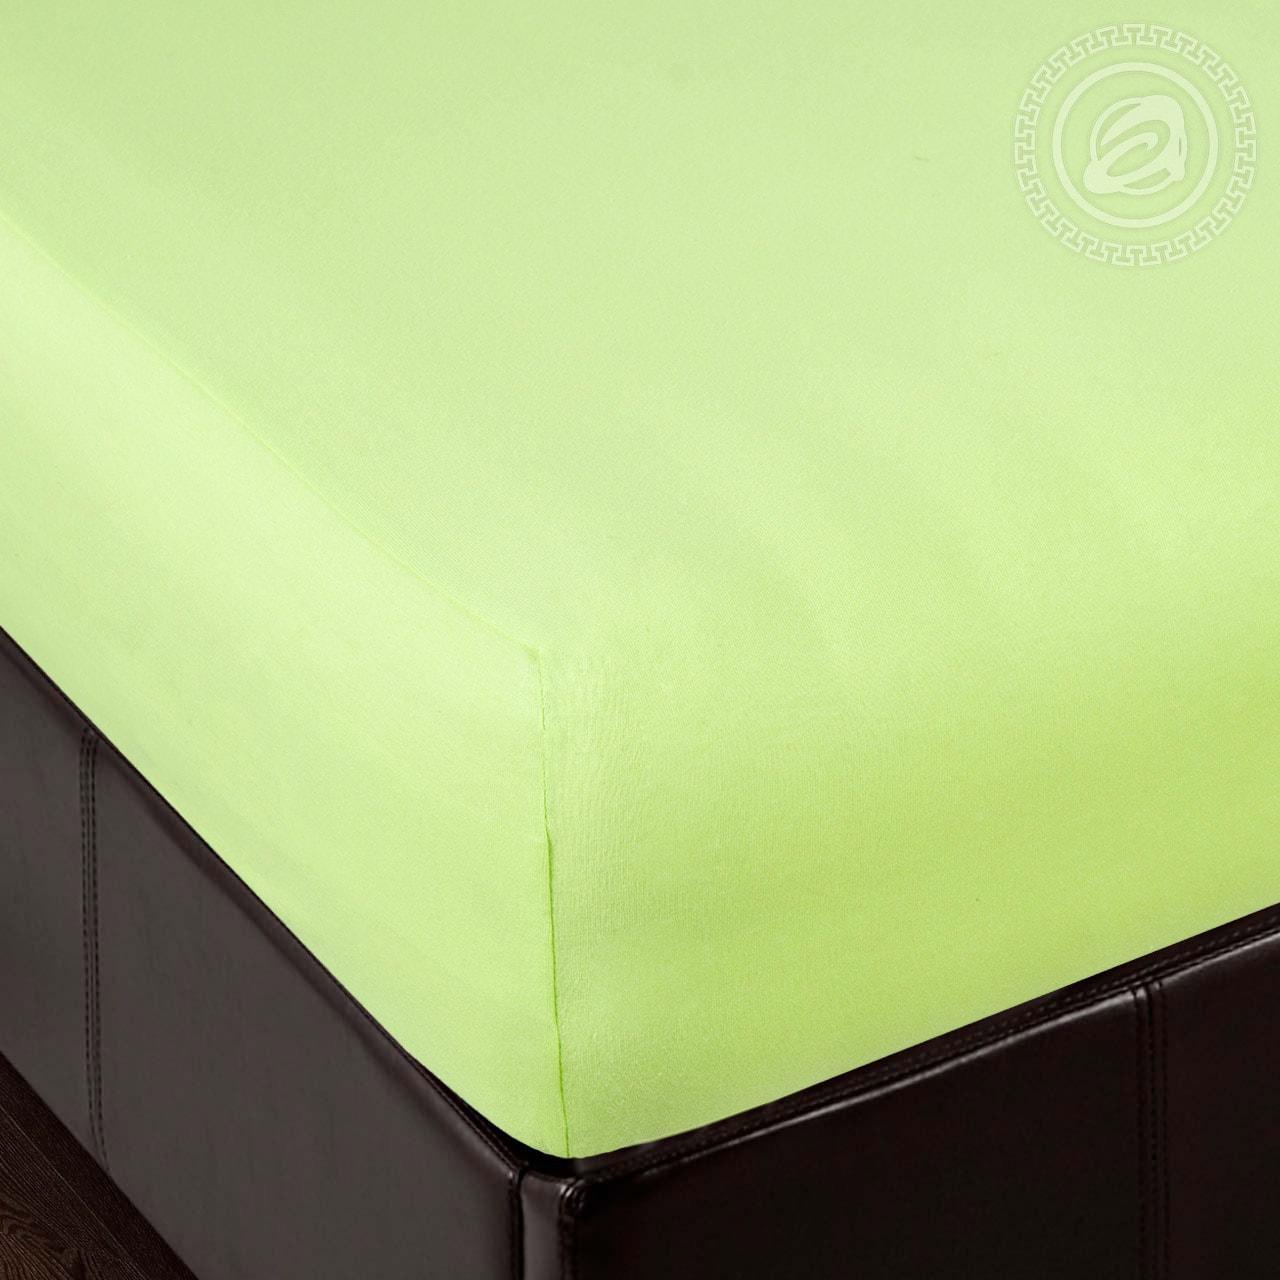 Простыня на резинке iv36287 (трикотаж) 60х120